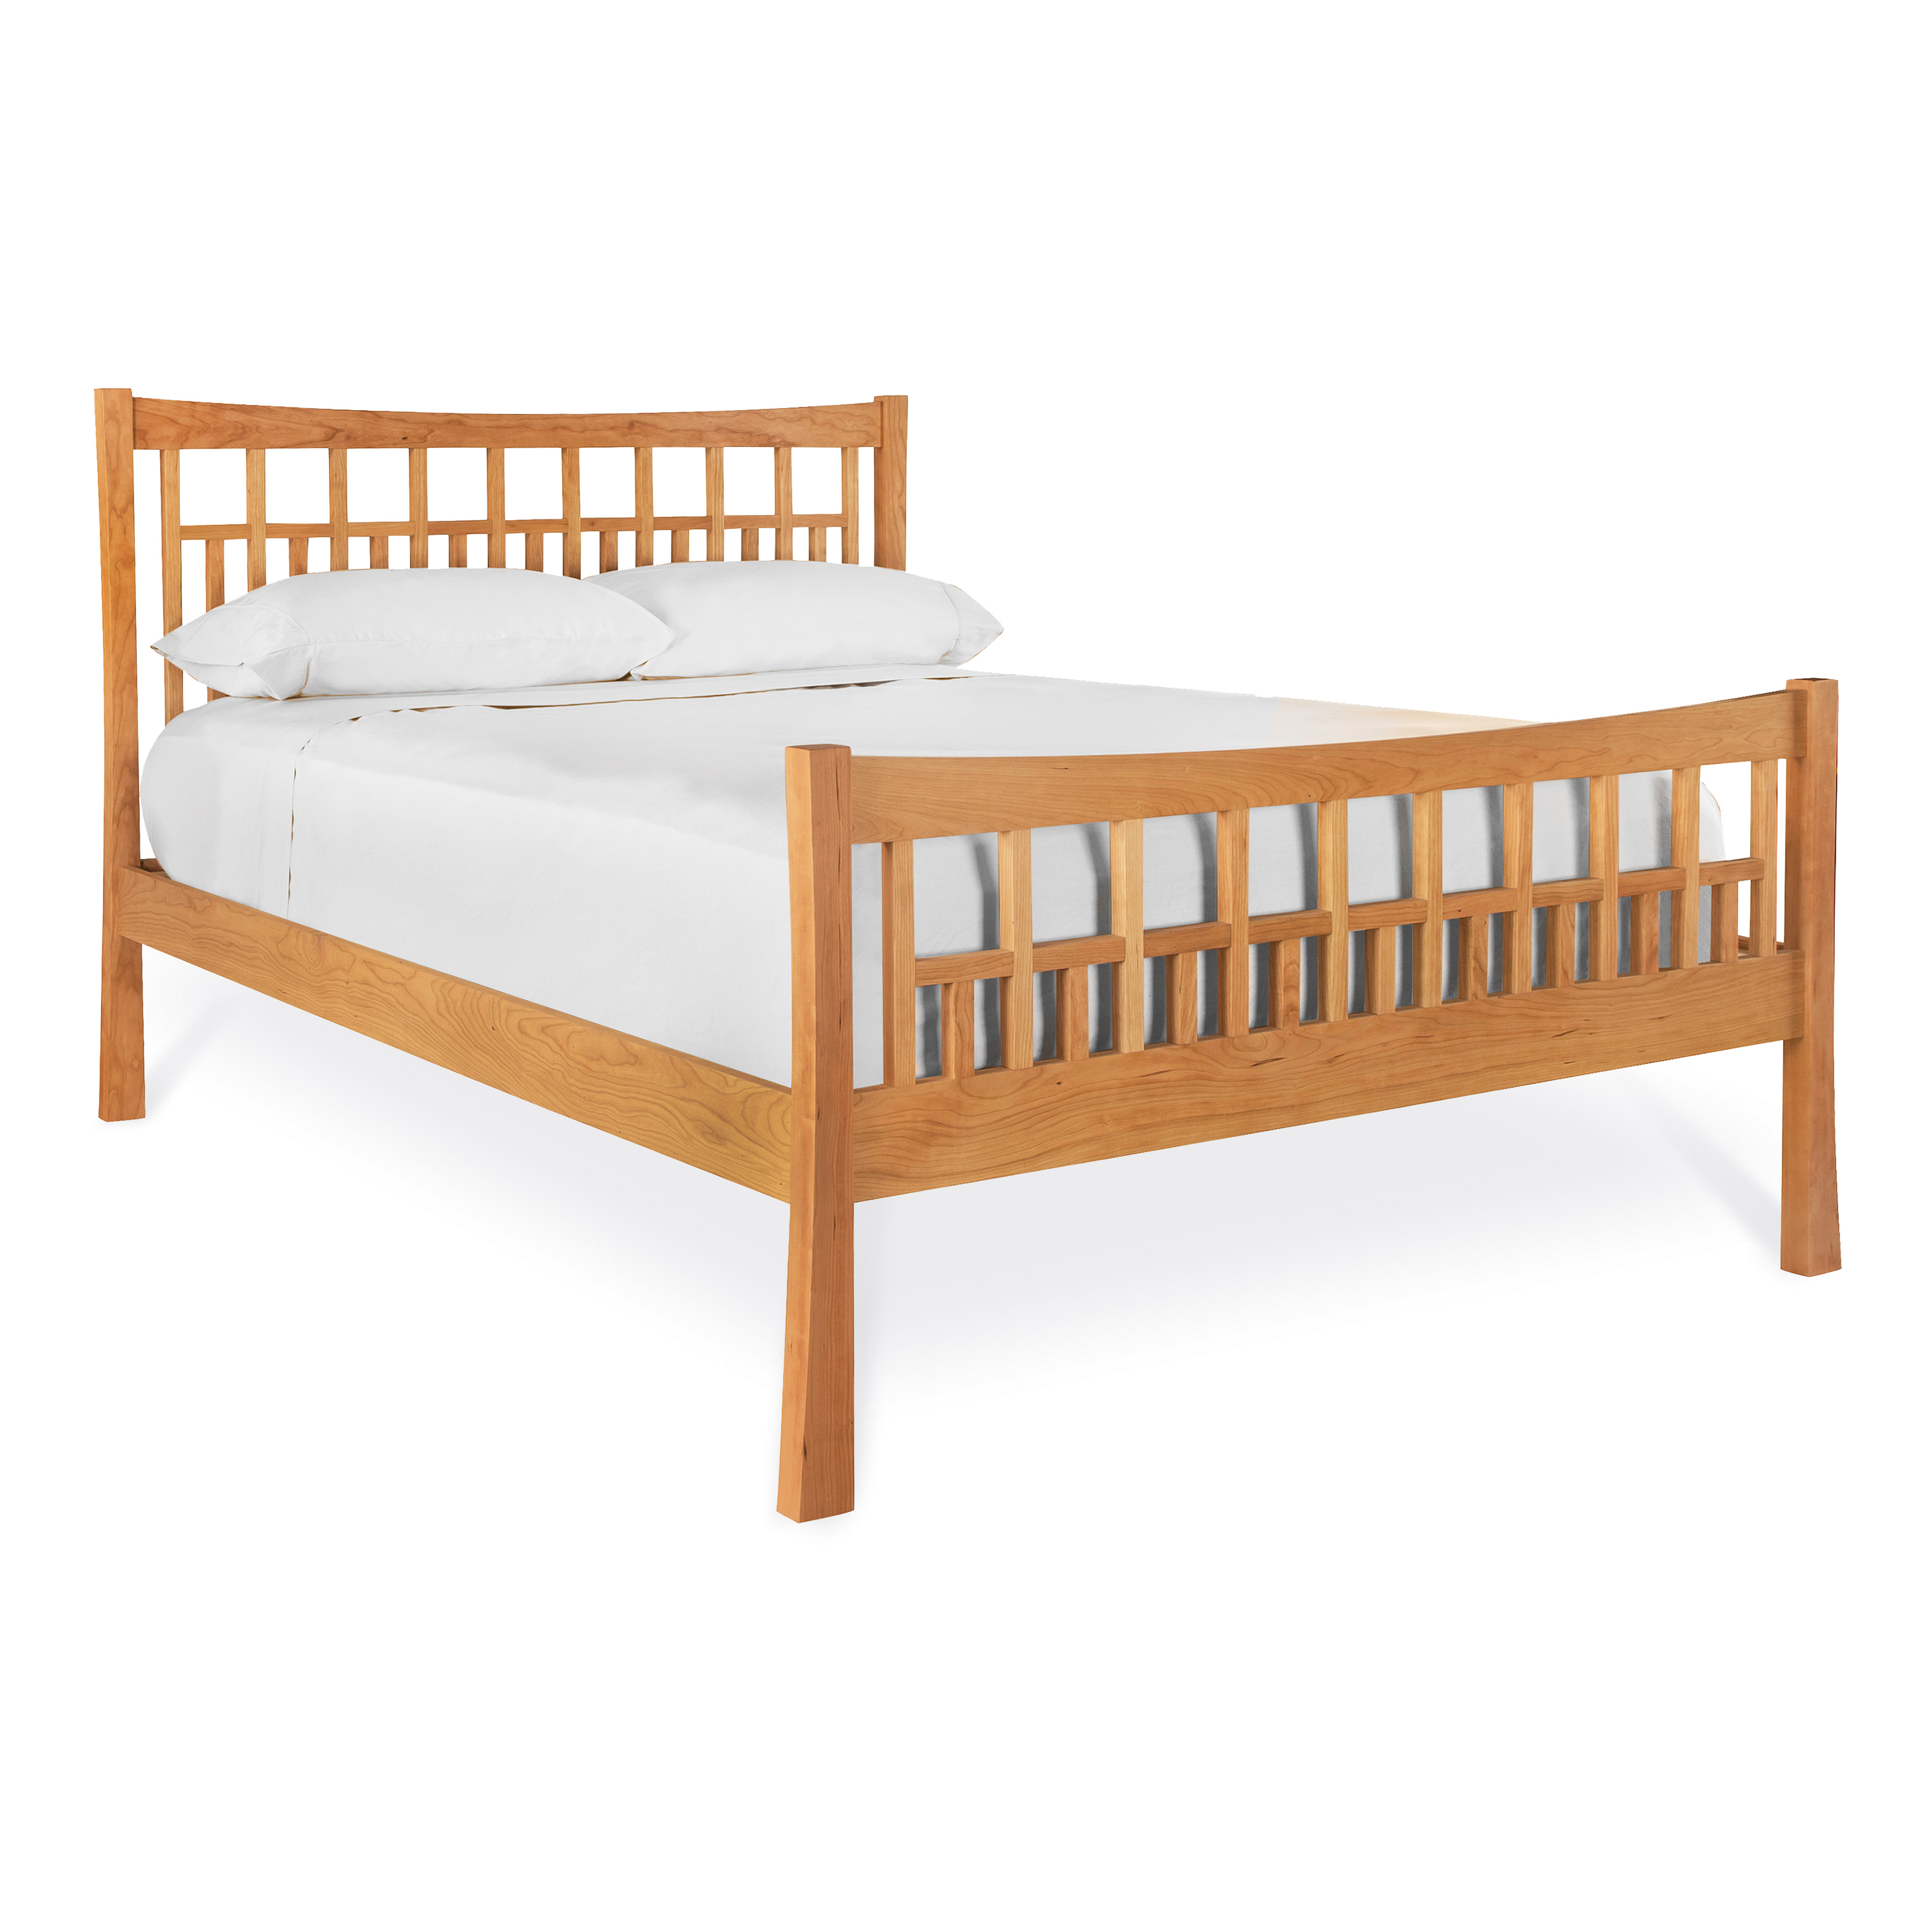 Contemporary Craftsman platform bed.